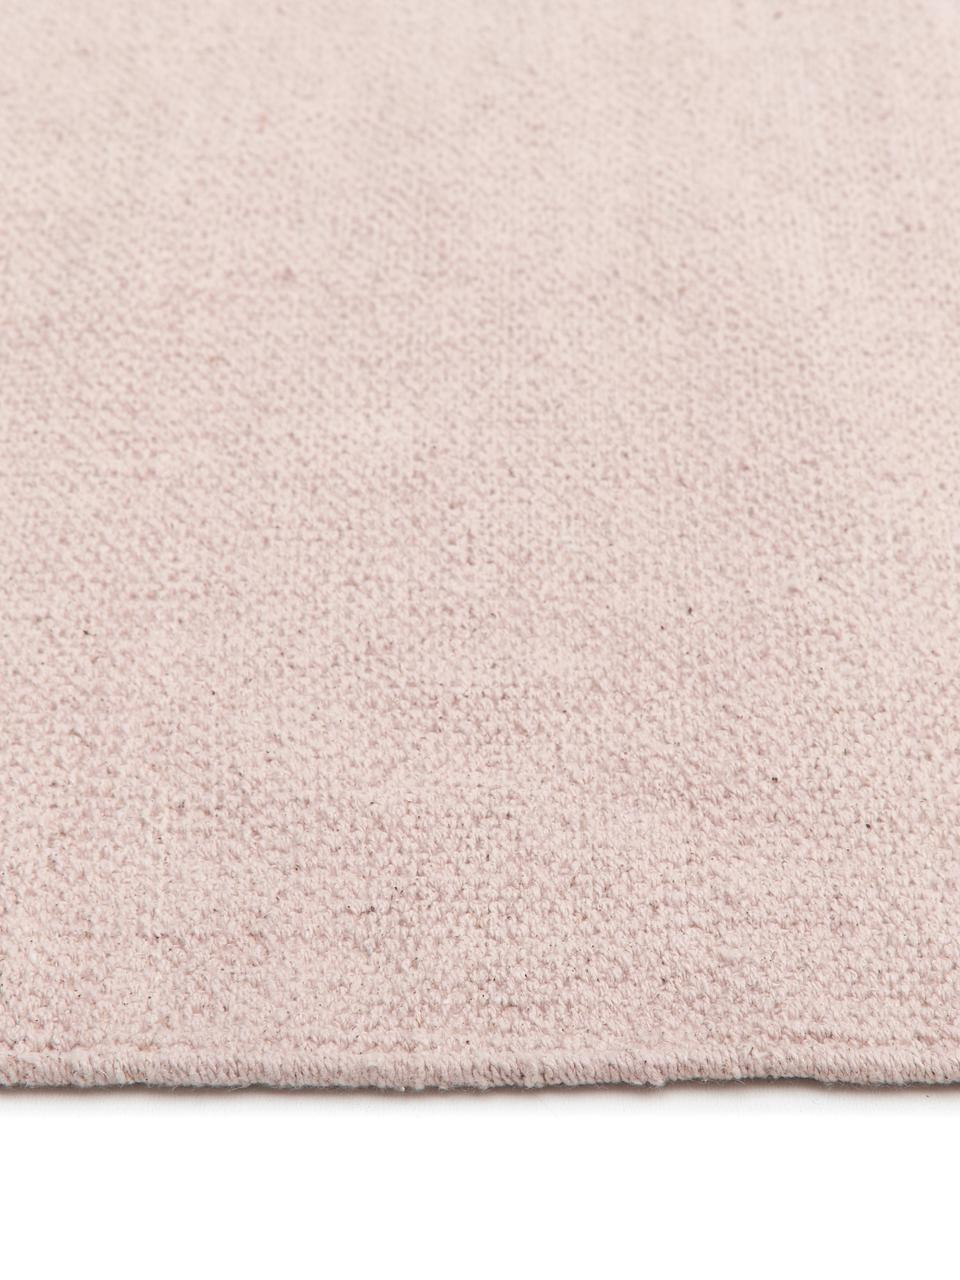 Dünner Baumwollteppich Agneta, handgewebt, 100% Baumwolle, Rosa, B 160 x L 230 cm (Größe M)